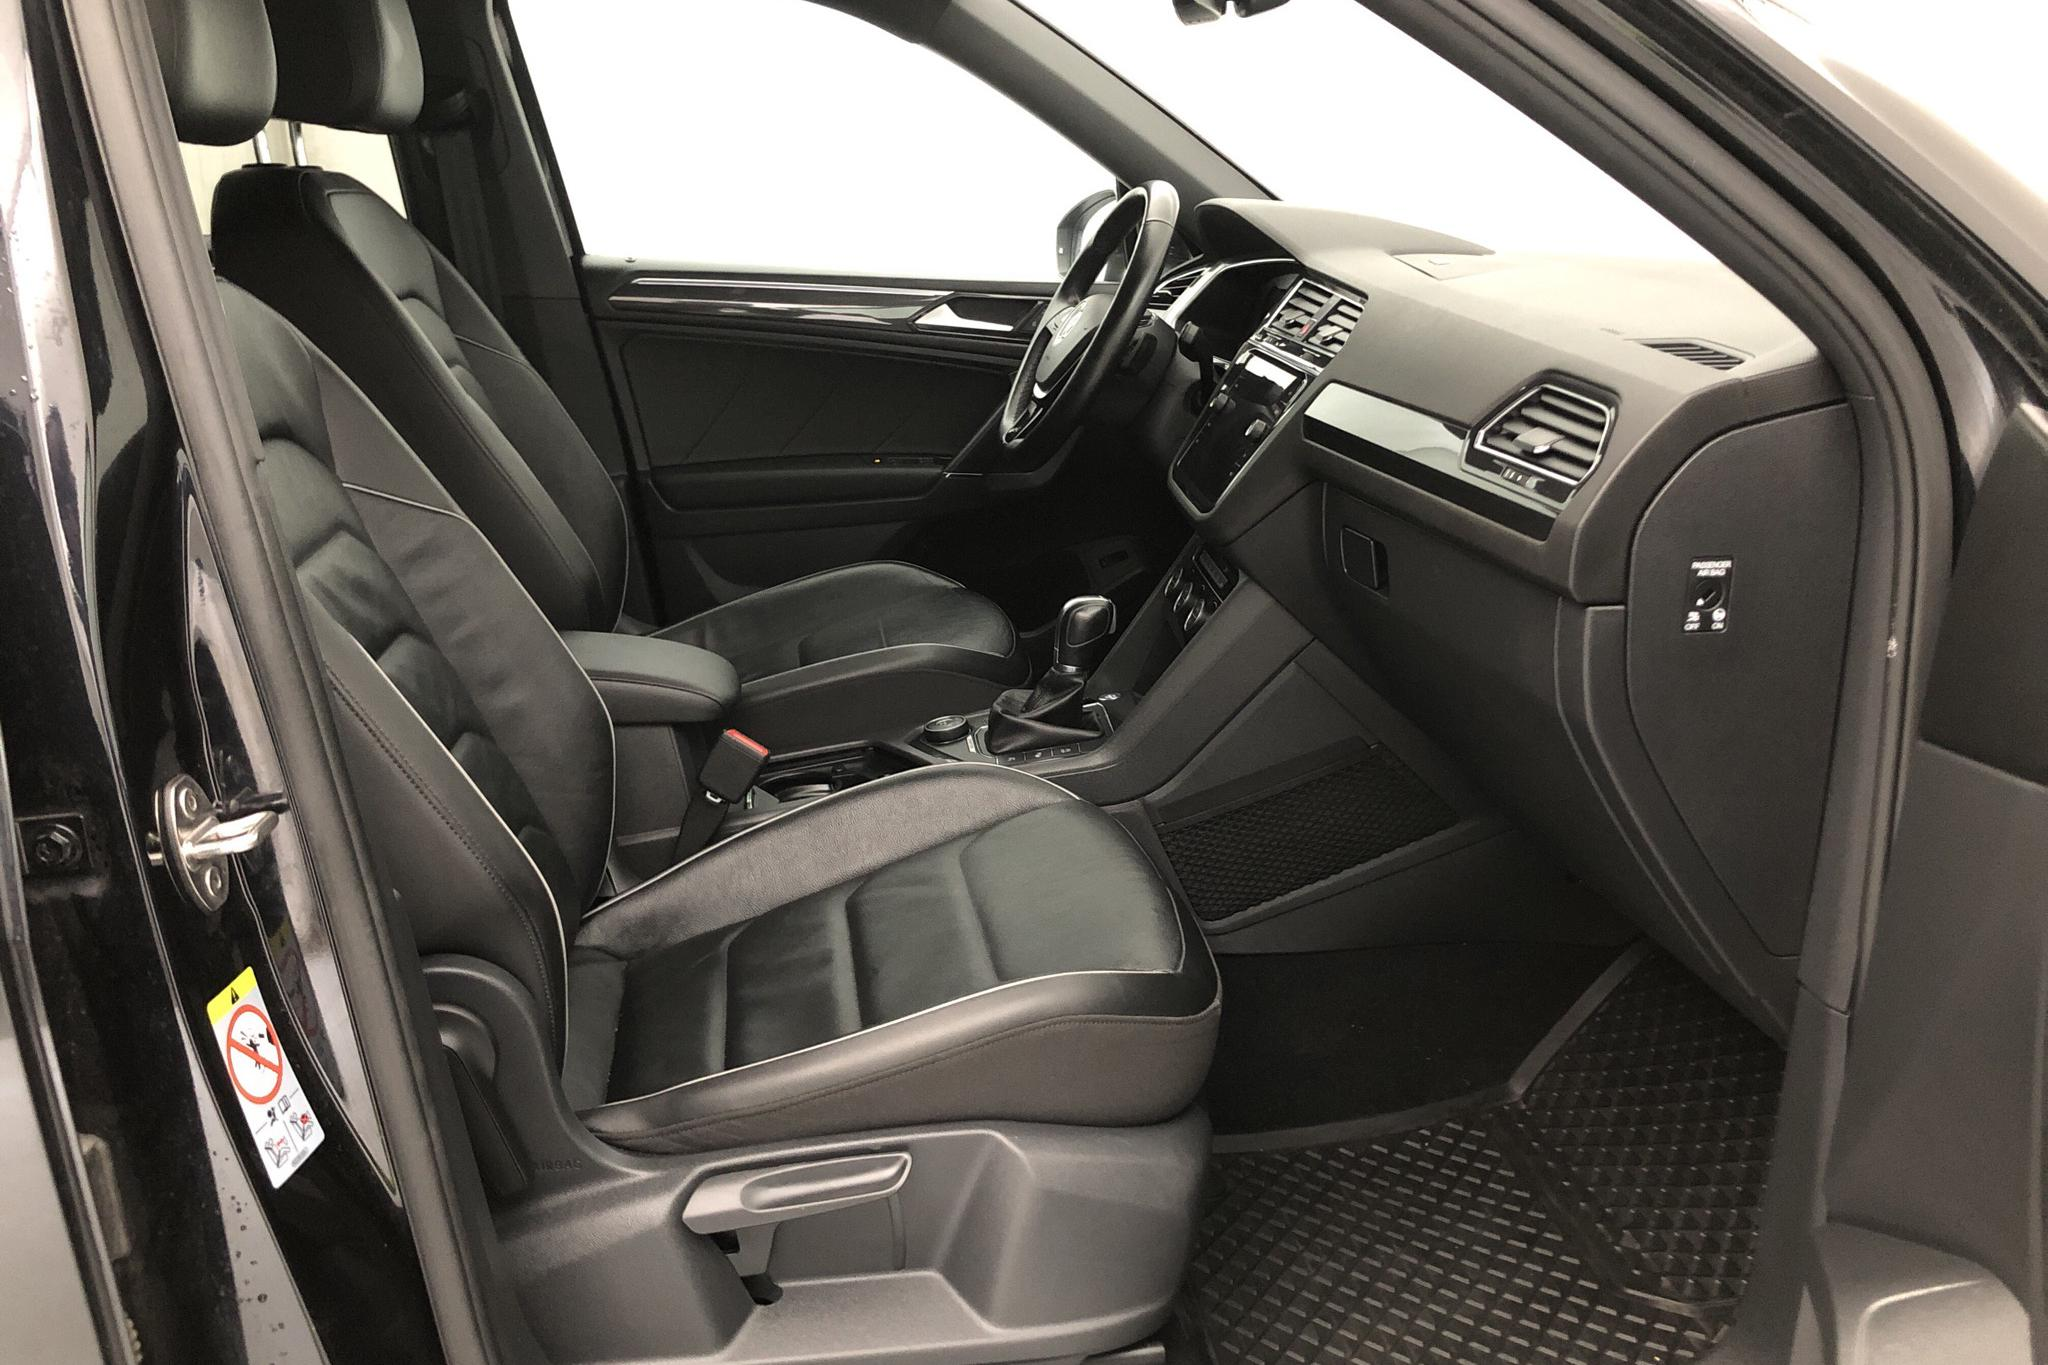 VW Tiguan Allspace 2.0 TDI 4MOTION (190hk) - 5 996 mil - Automat - svart - 2018